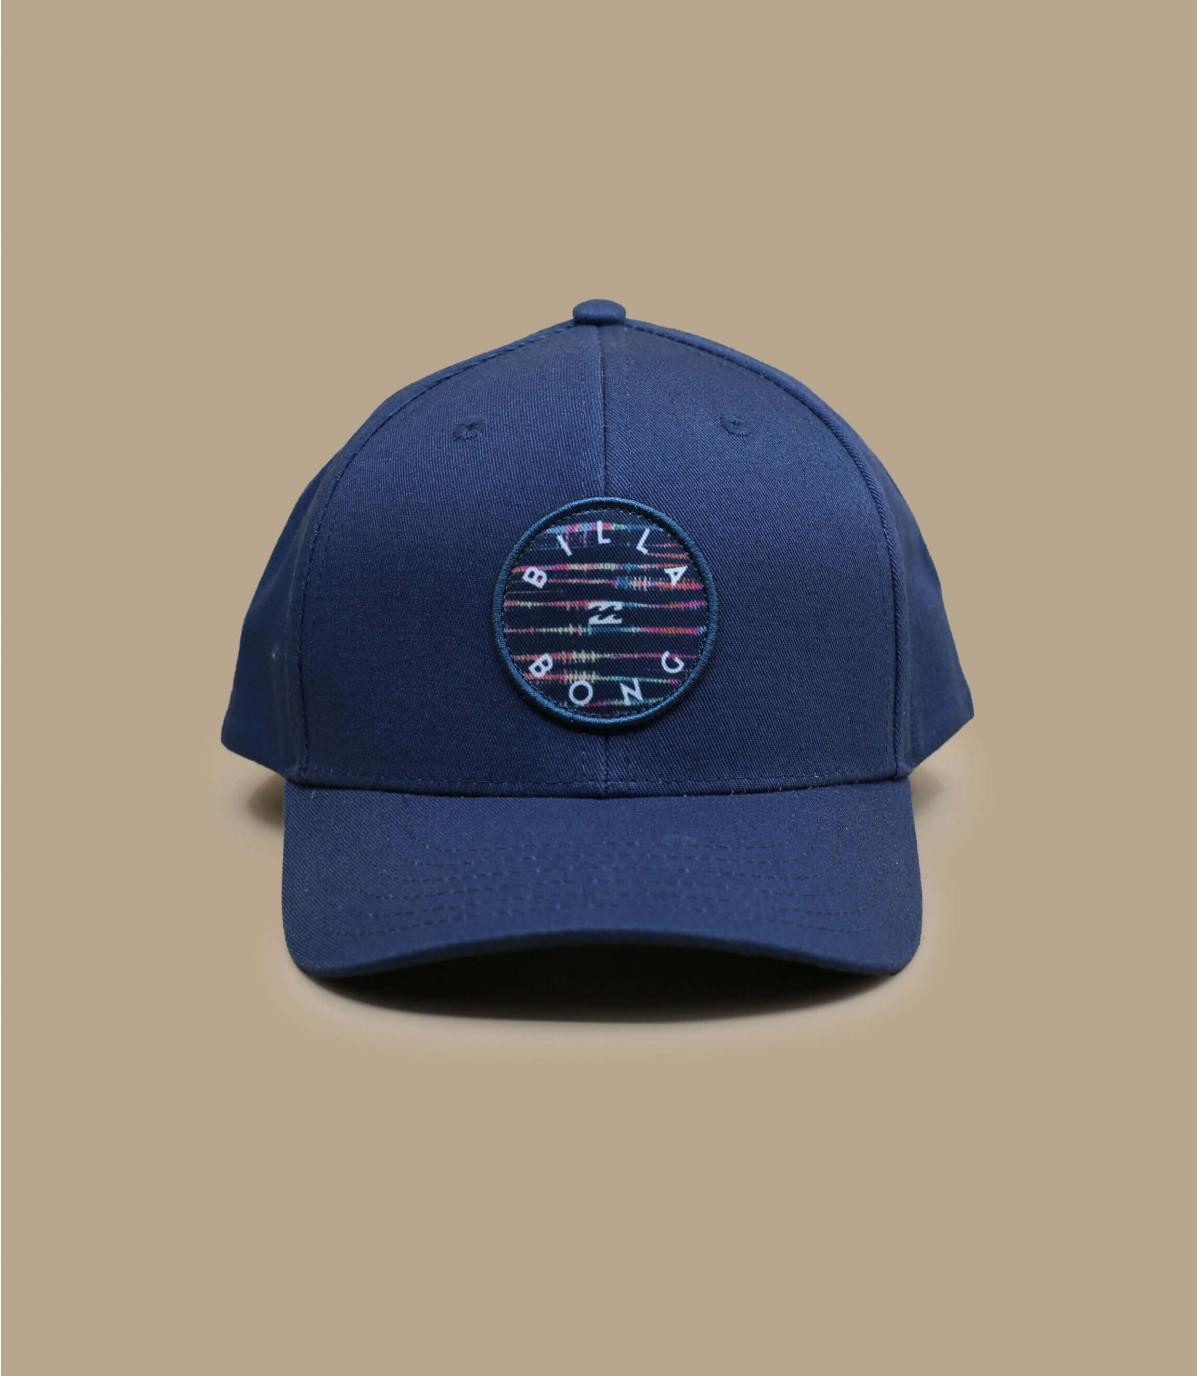 casquette Billabong enfant bleu